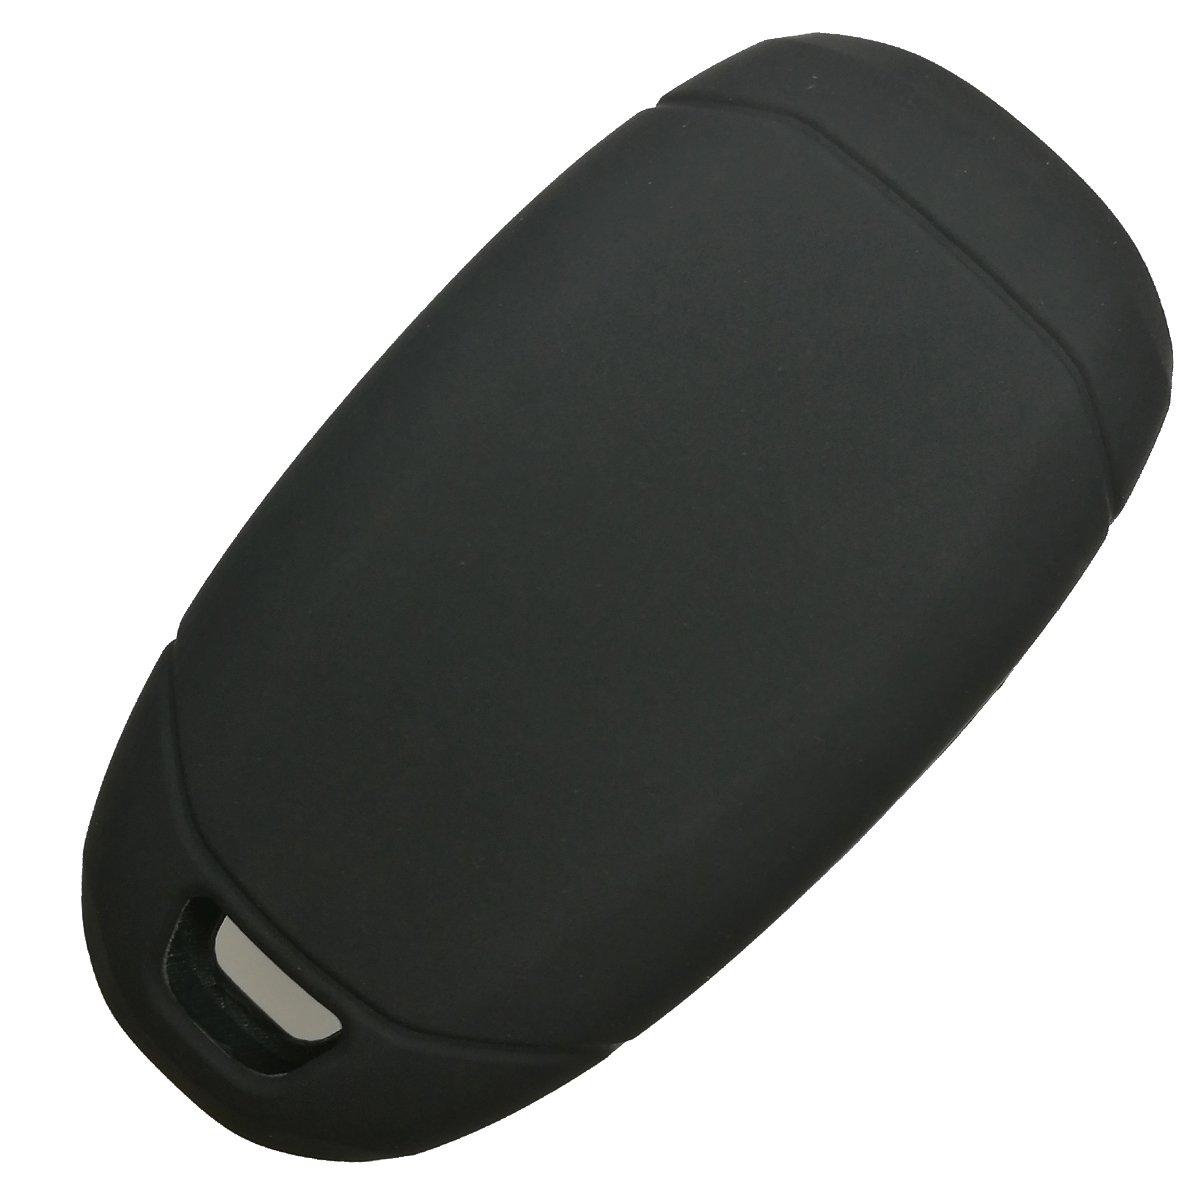 2Pcs Coolbestda Rubber 4 Buttons Key Fob Remote Cover Case Protector Keyless Jacket for 2017 Hyundai Azera Grandeur IG Black